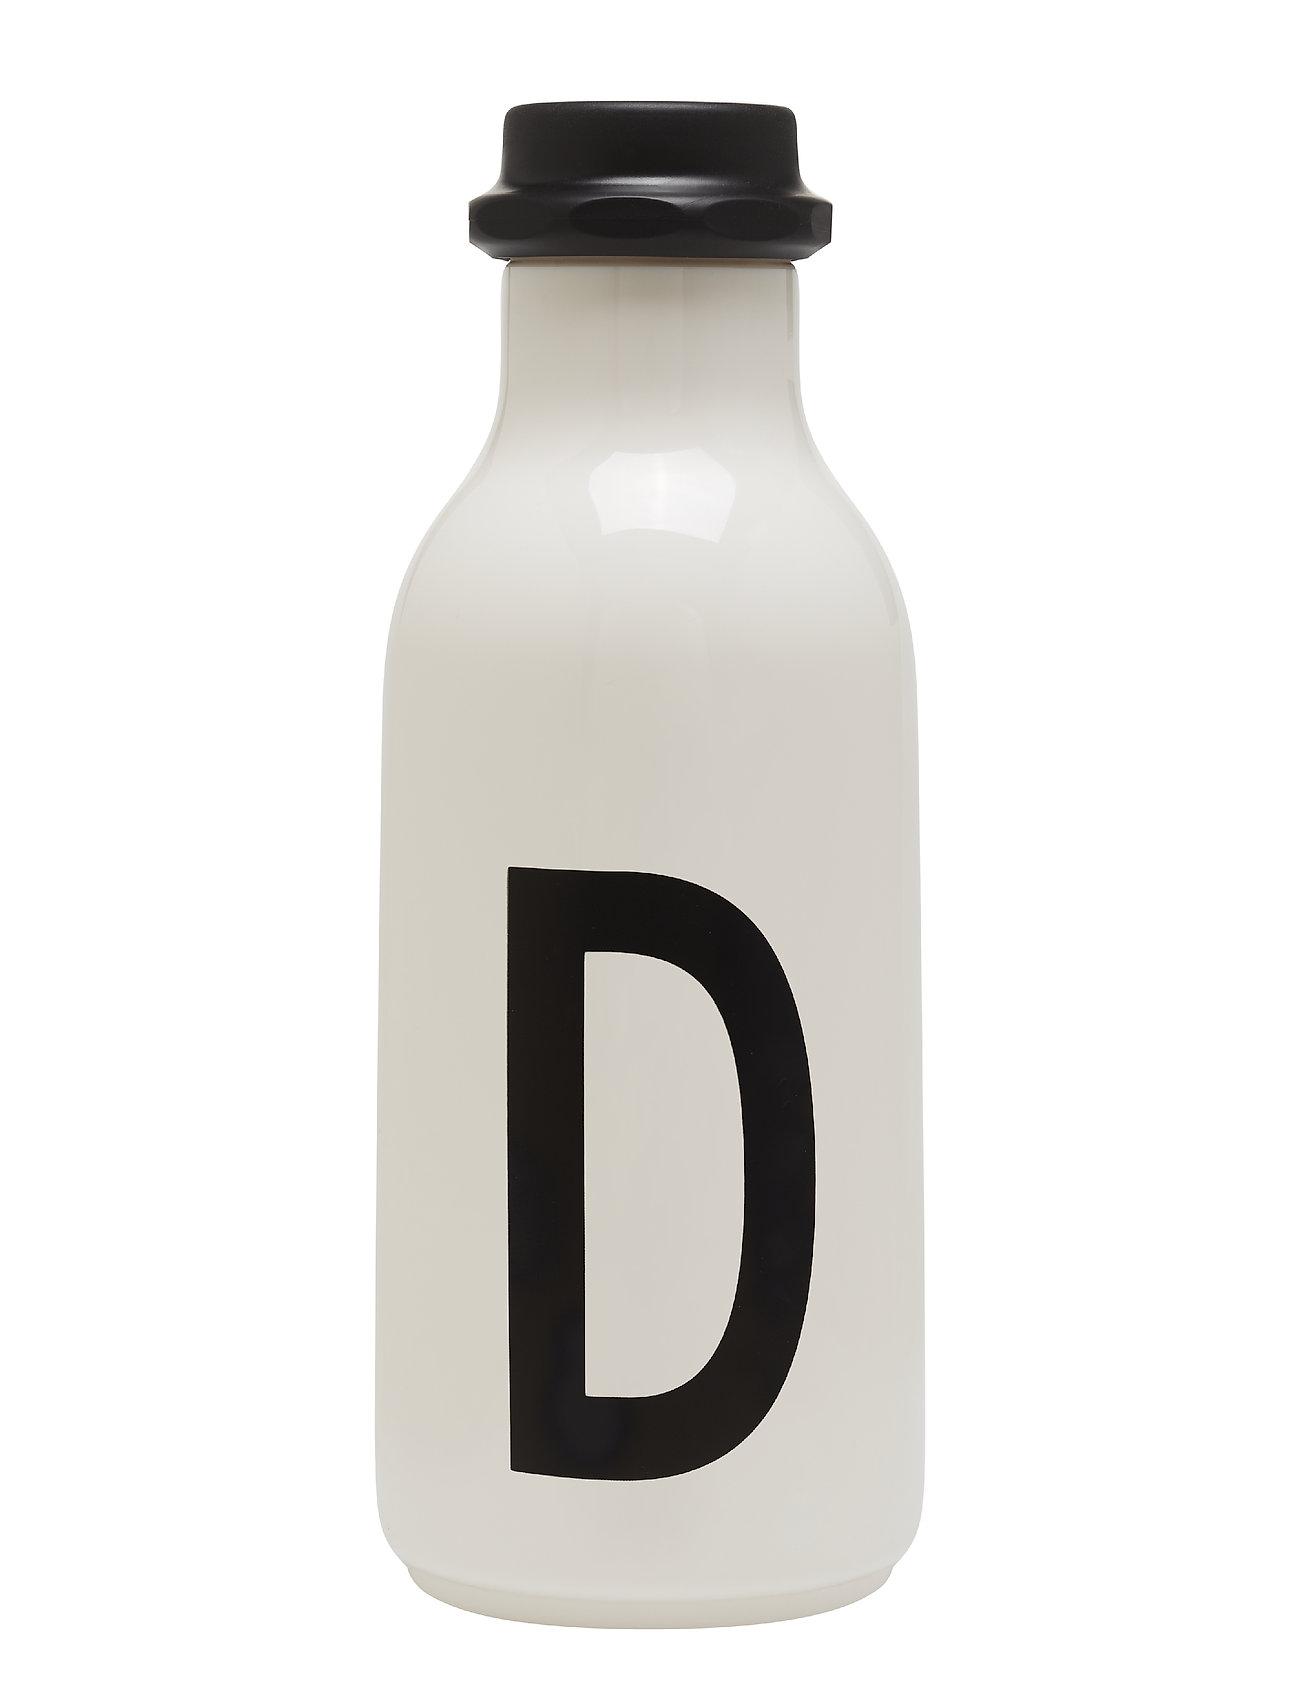 Water A zwhiteDesign Bottle zwhiteDesign A Letters Letters Bottle Water hdCsrtQ